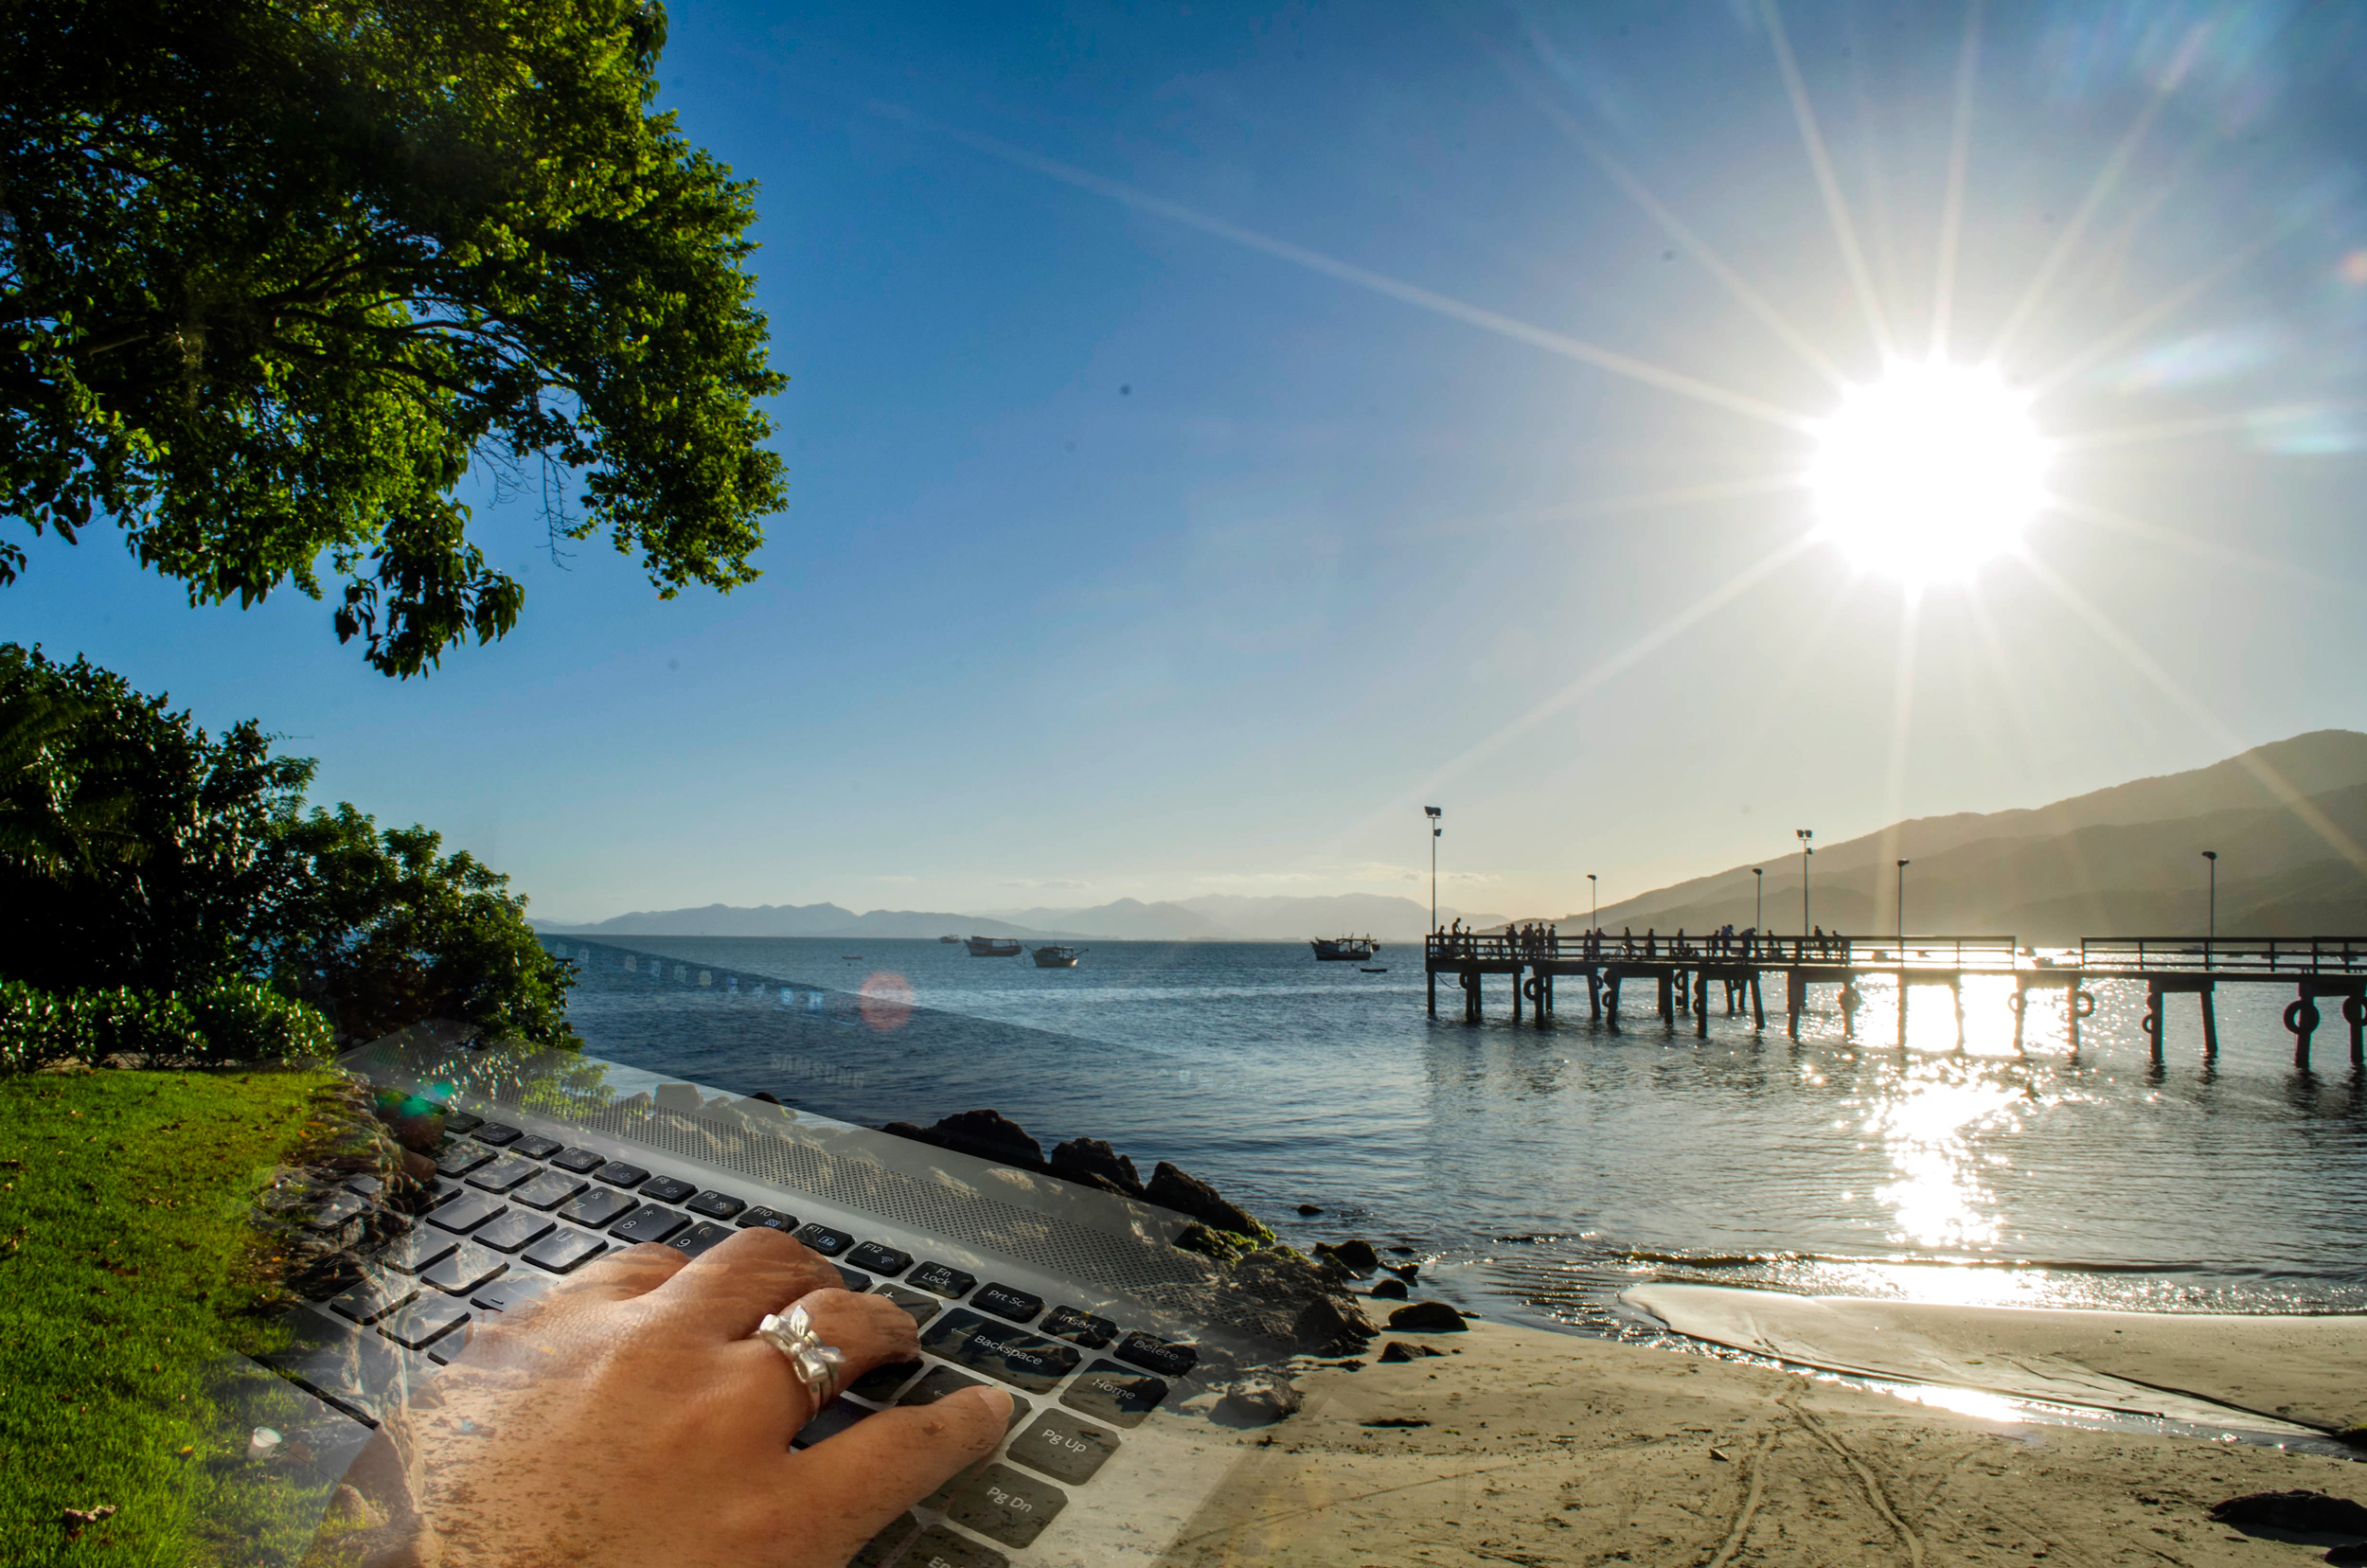 Guest Post - Turismo em Santa Catarina sobre diferentes perspectivas